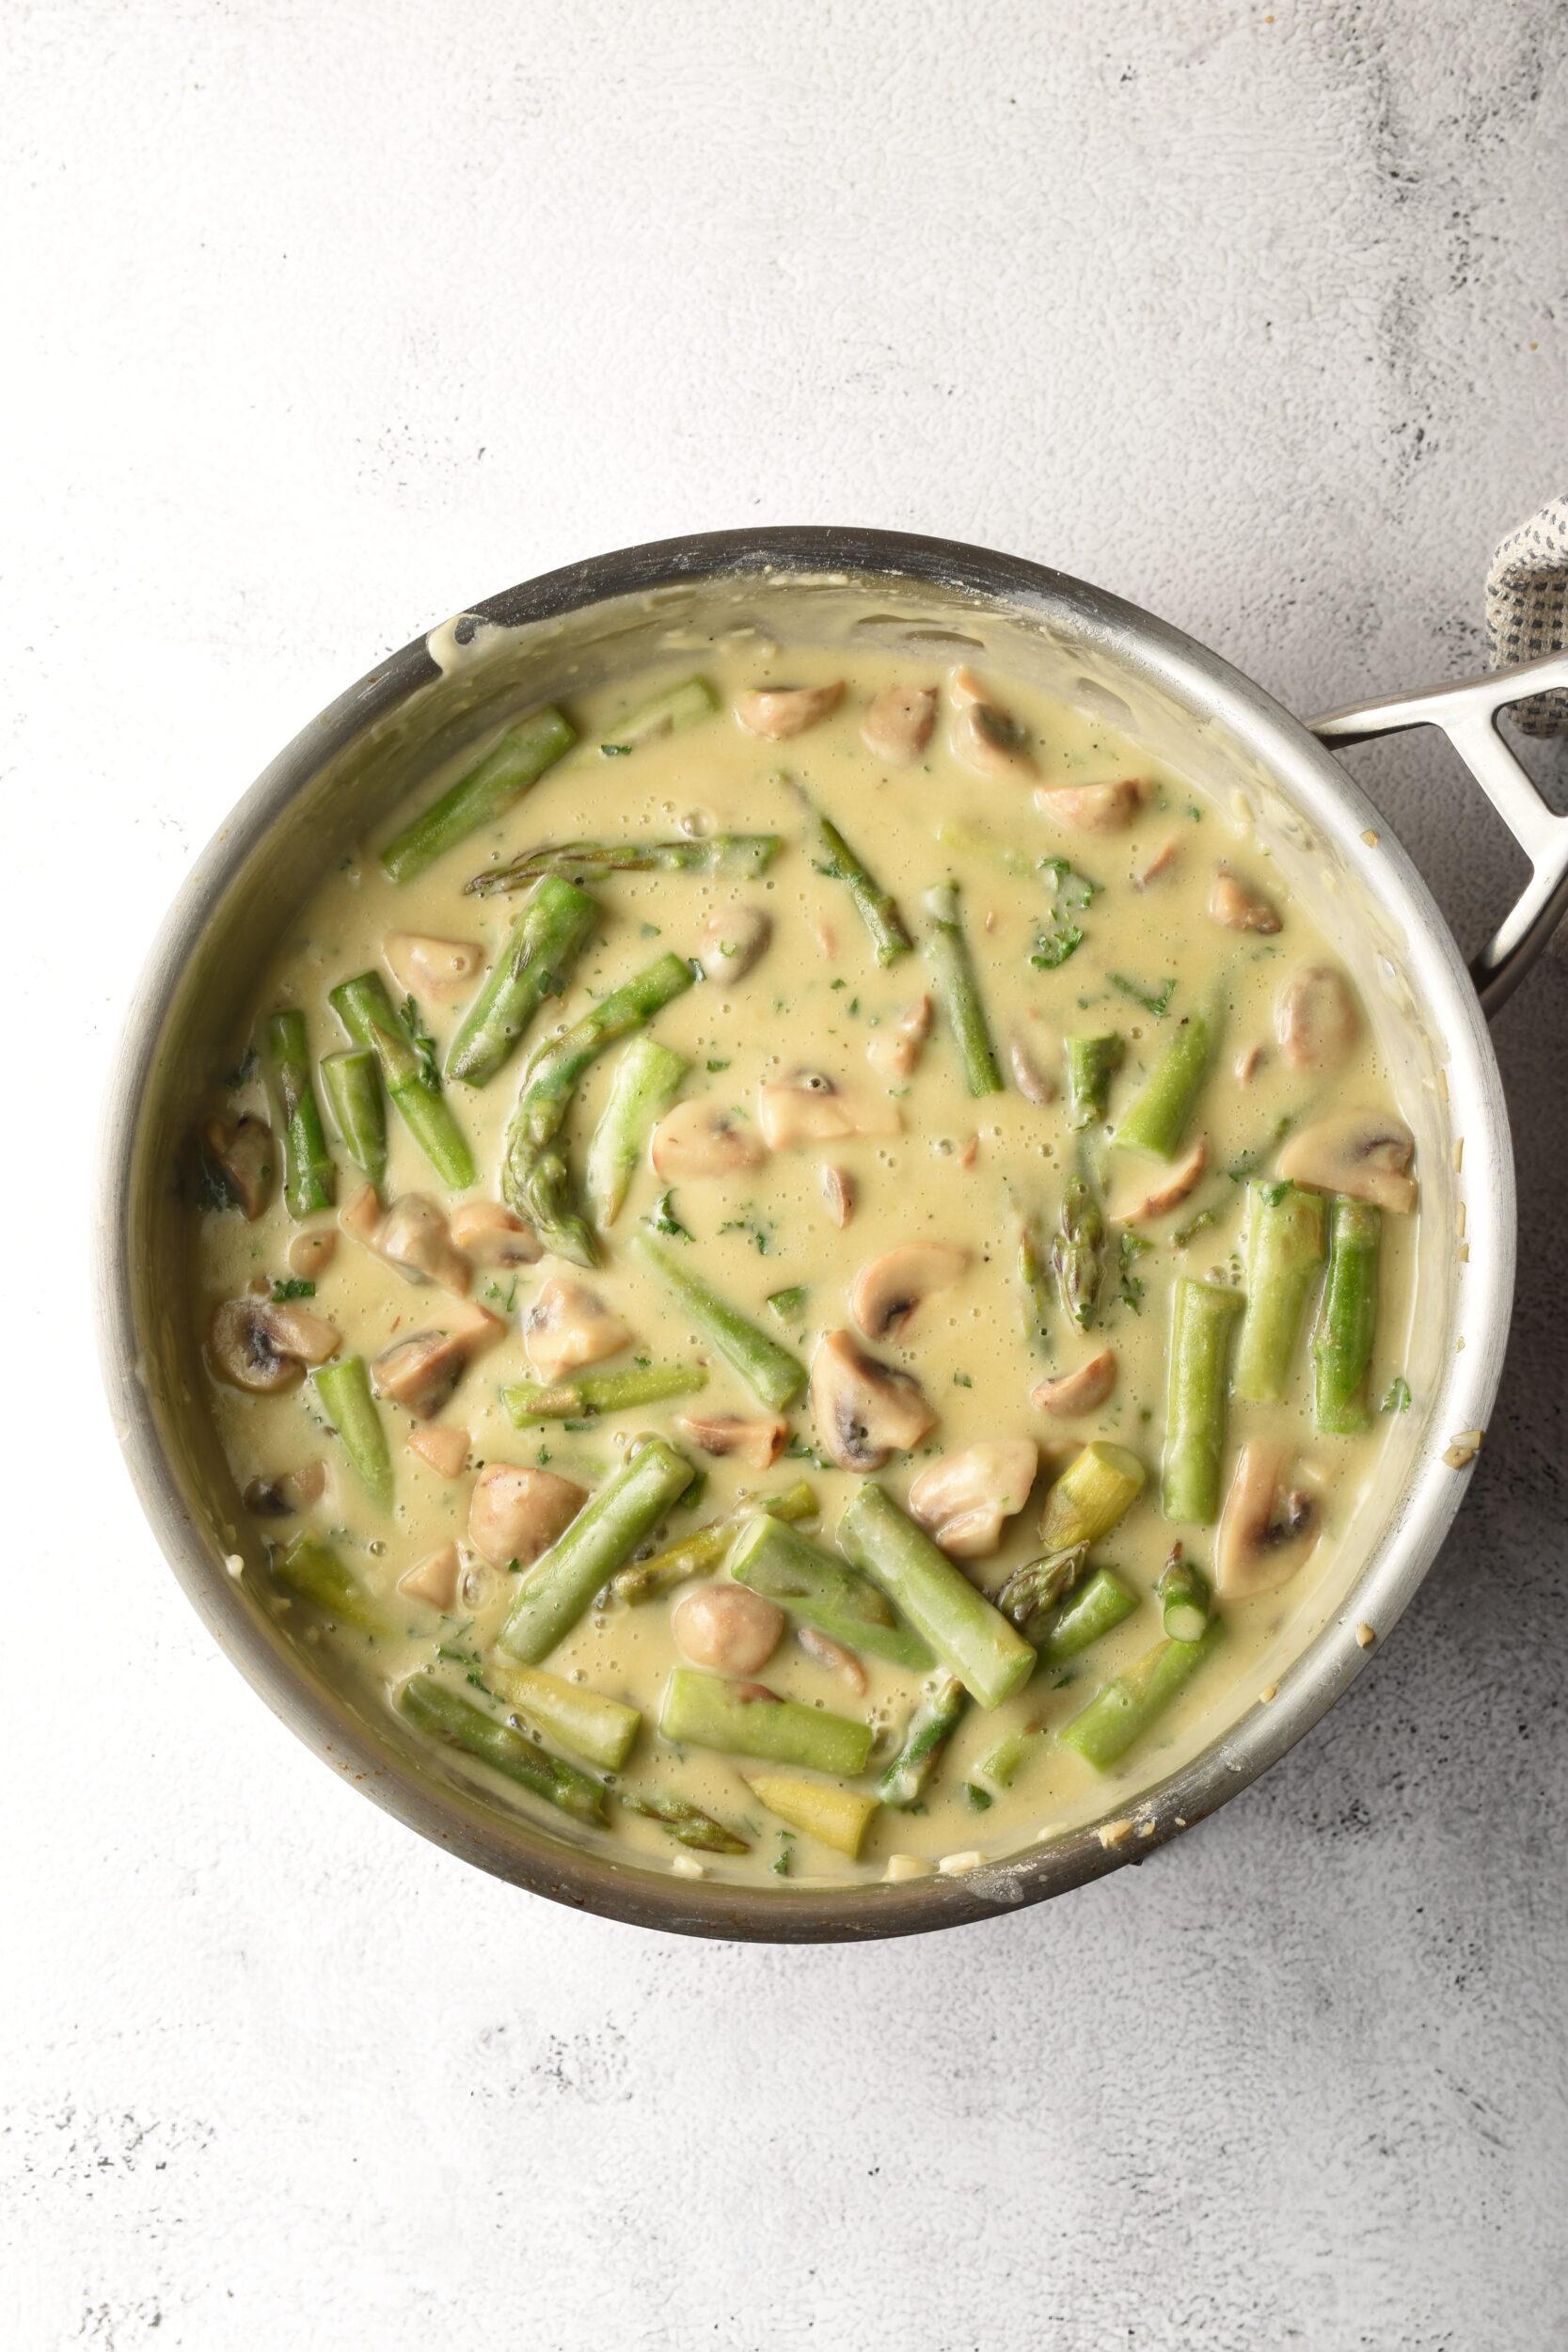 Mushroom and Asparagus Vegan Creamy Nut Free Alfredo Pasta Sauce